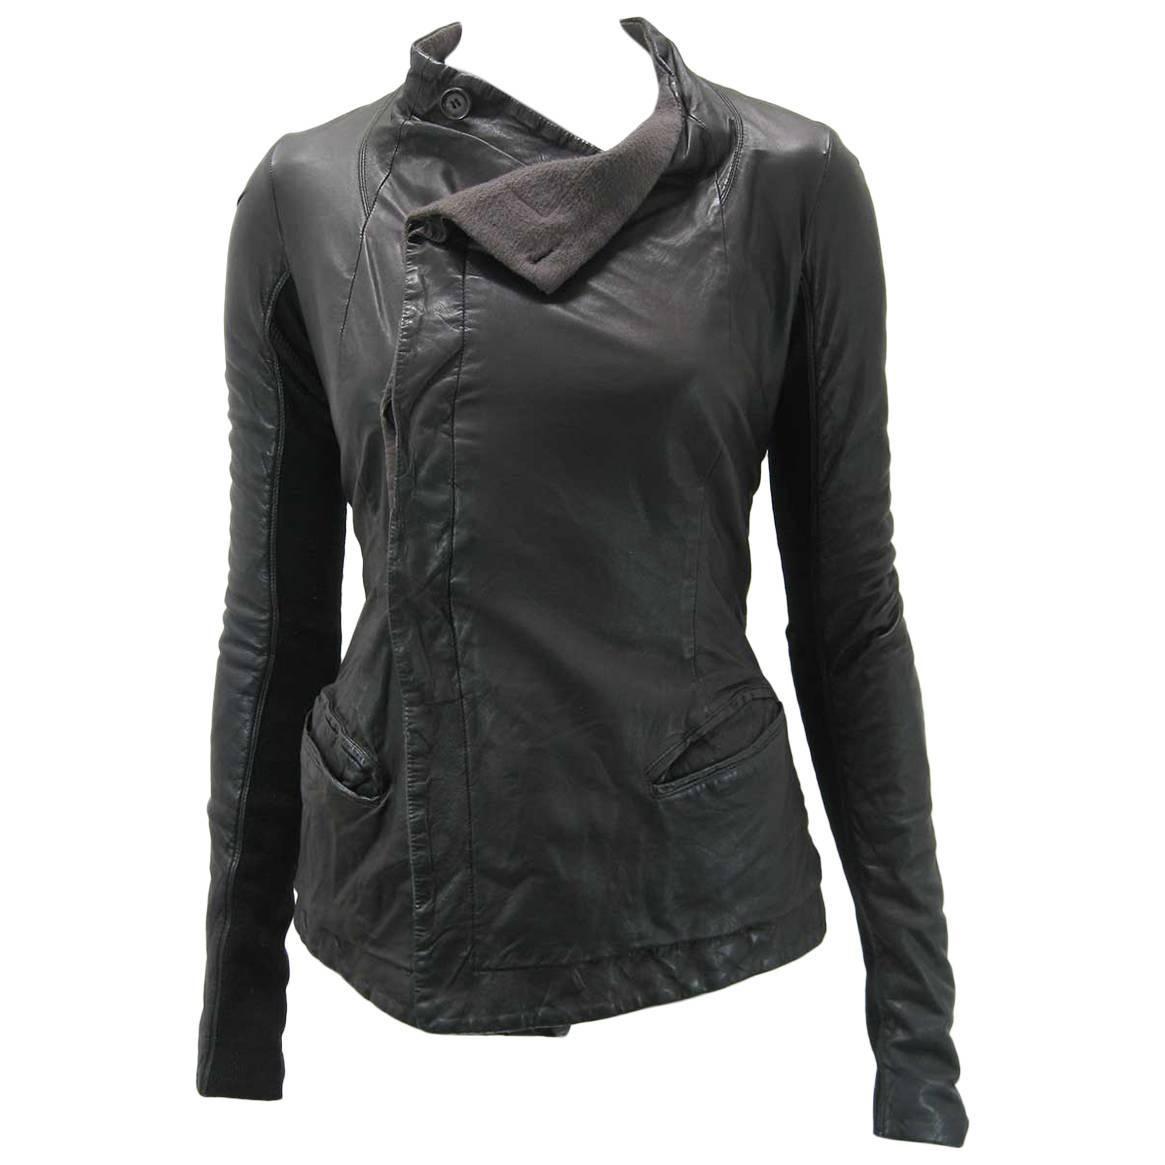 Rick Owens Black Leather Asymmetrical Biker Jacket